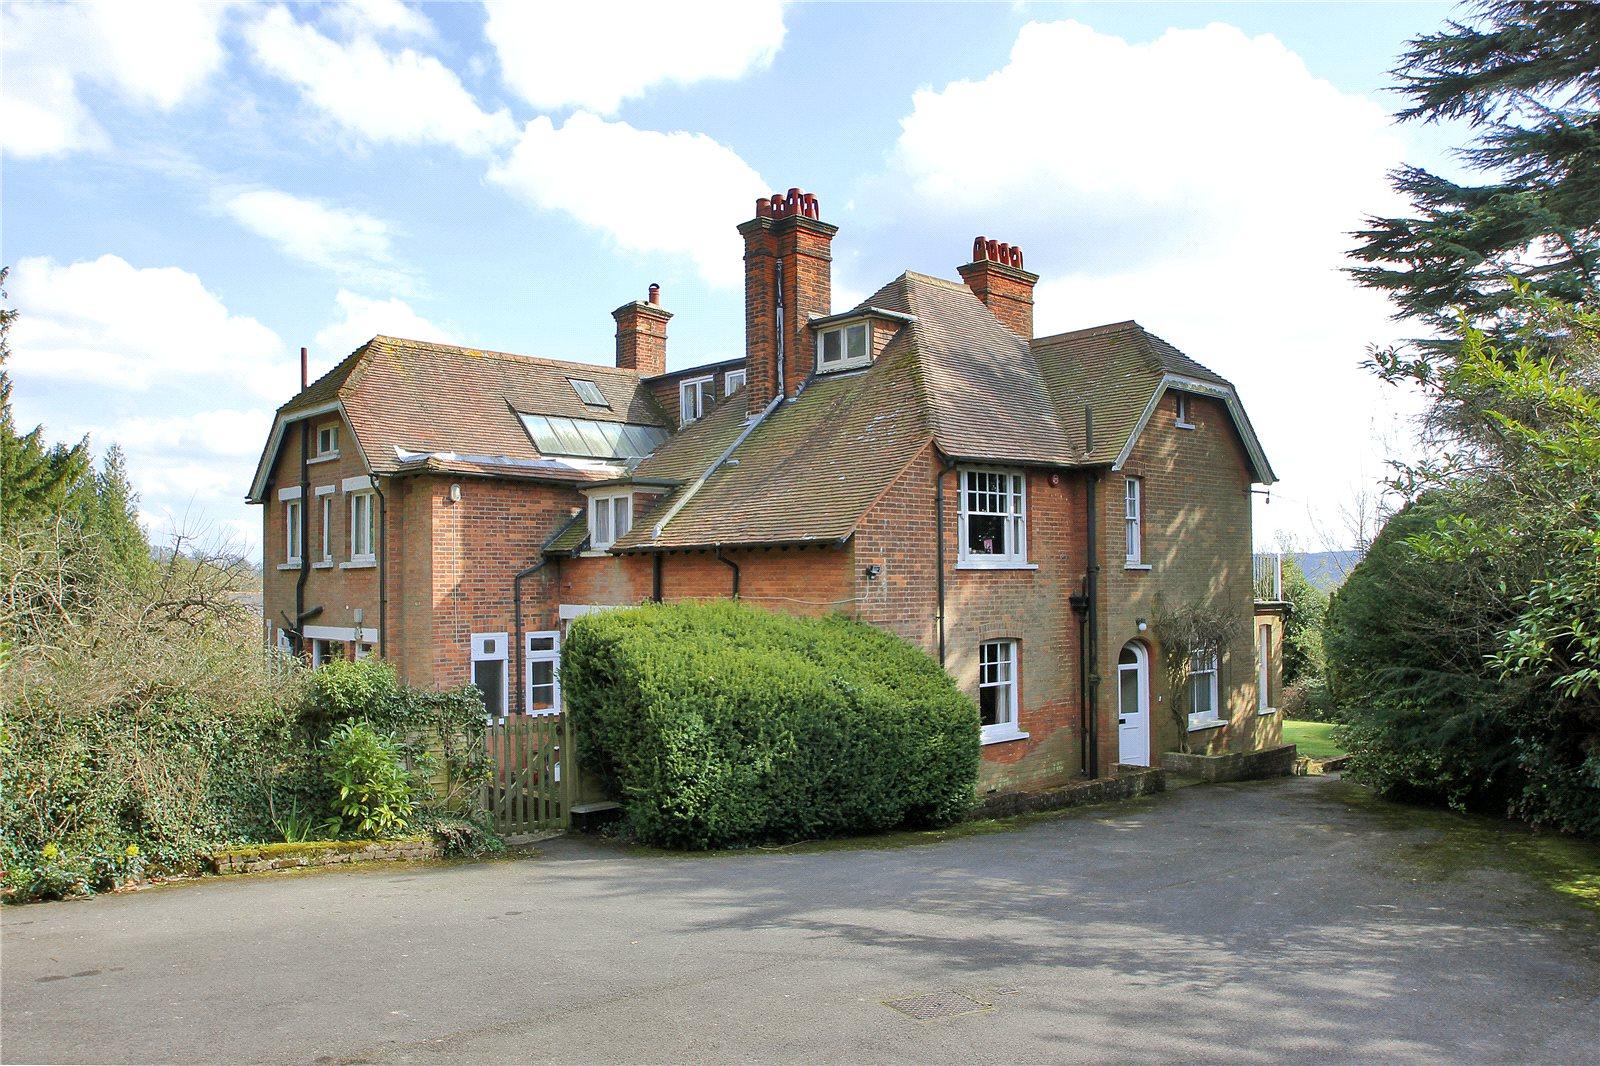 Villa per Vendita alle ore Cotmans Ash Lane, Kemsing, Sevenoaks, Kent, TN15 Sevenoaks, Inghilterra